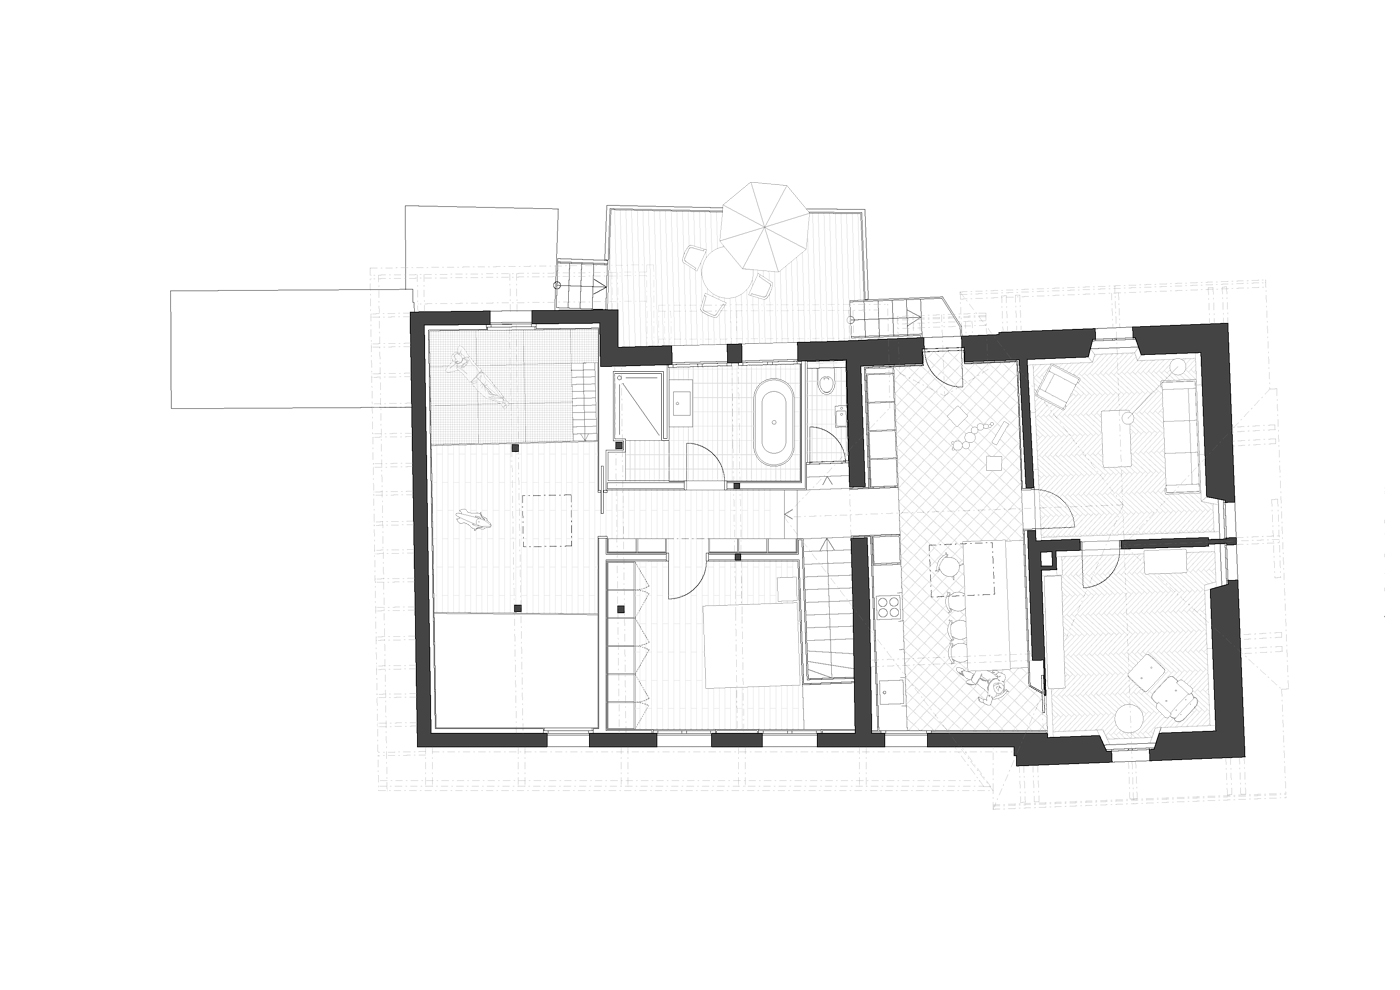 buan architekten – Umbau Bernstrasse Luzern – Grundriss Obergeschoss